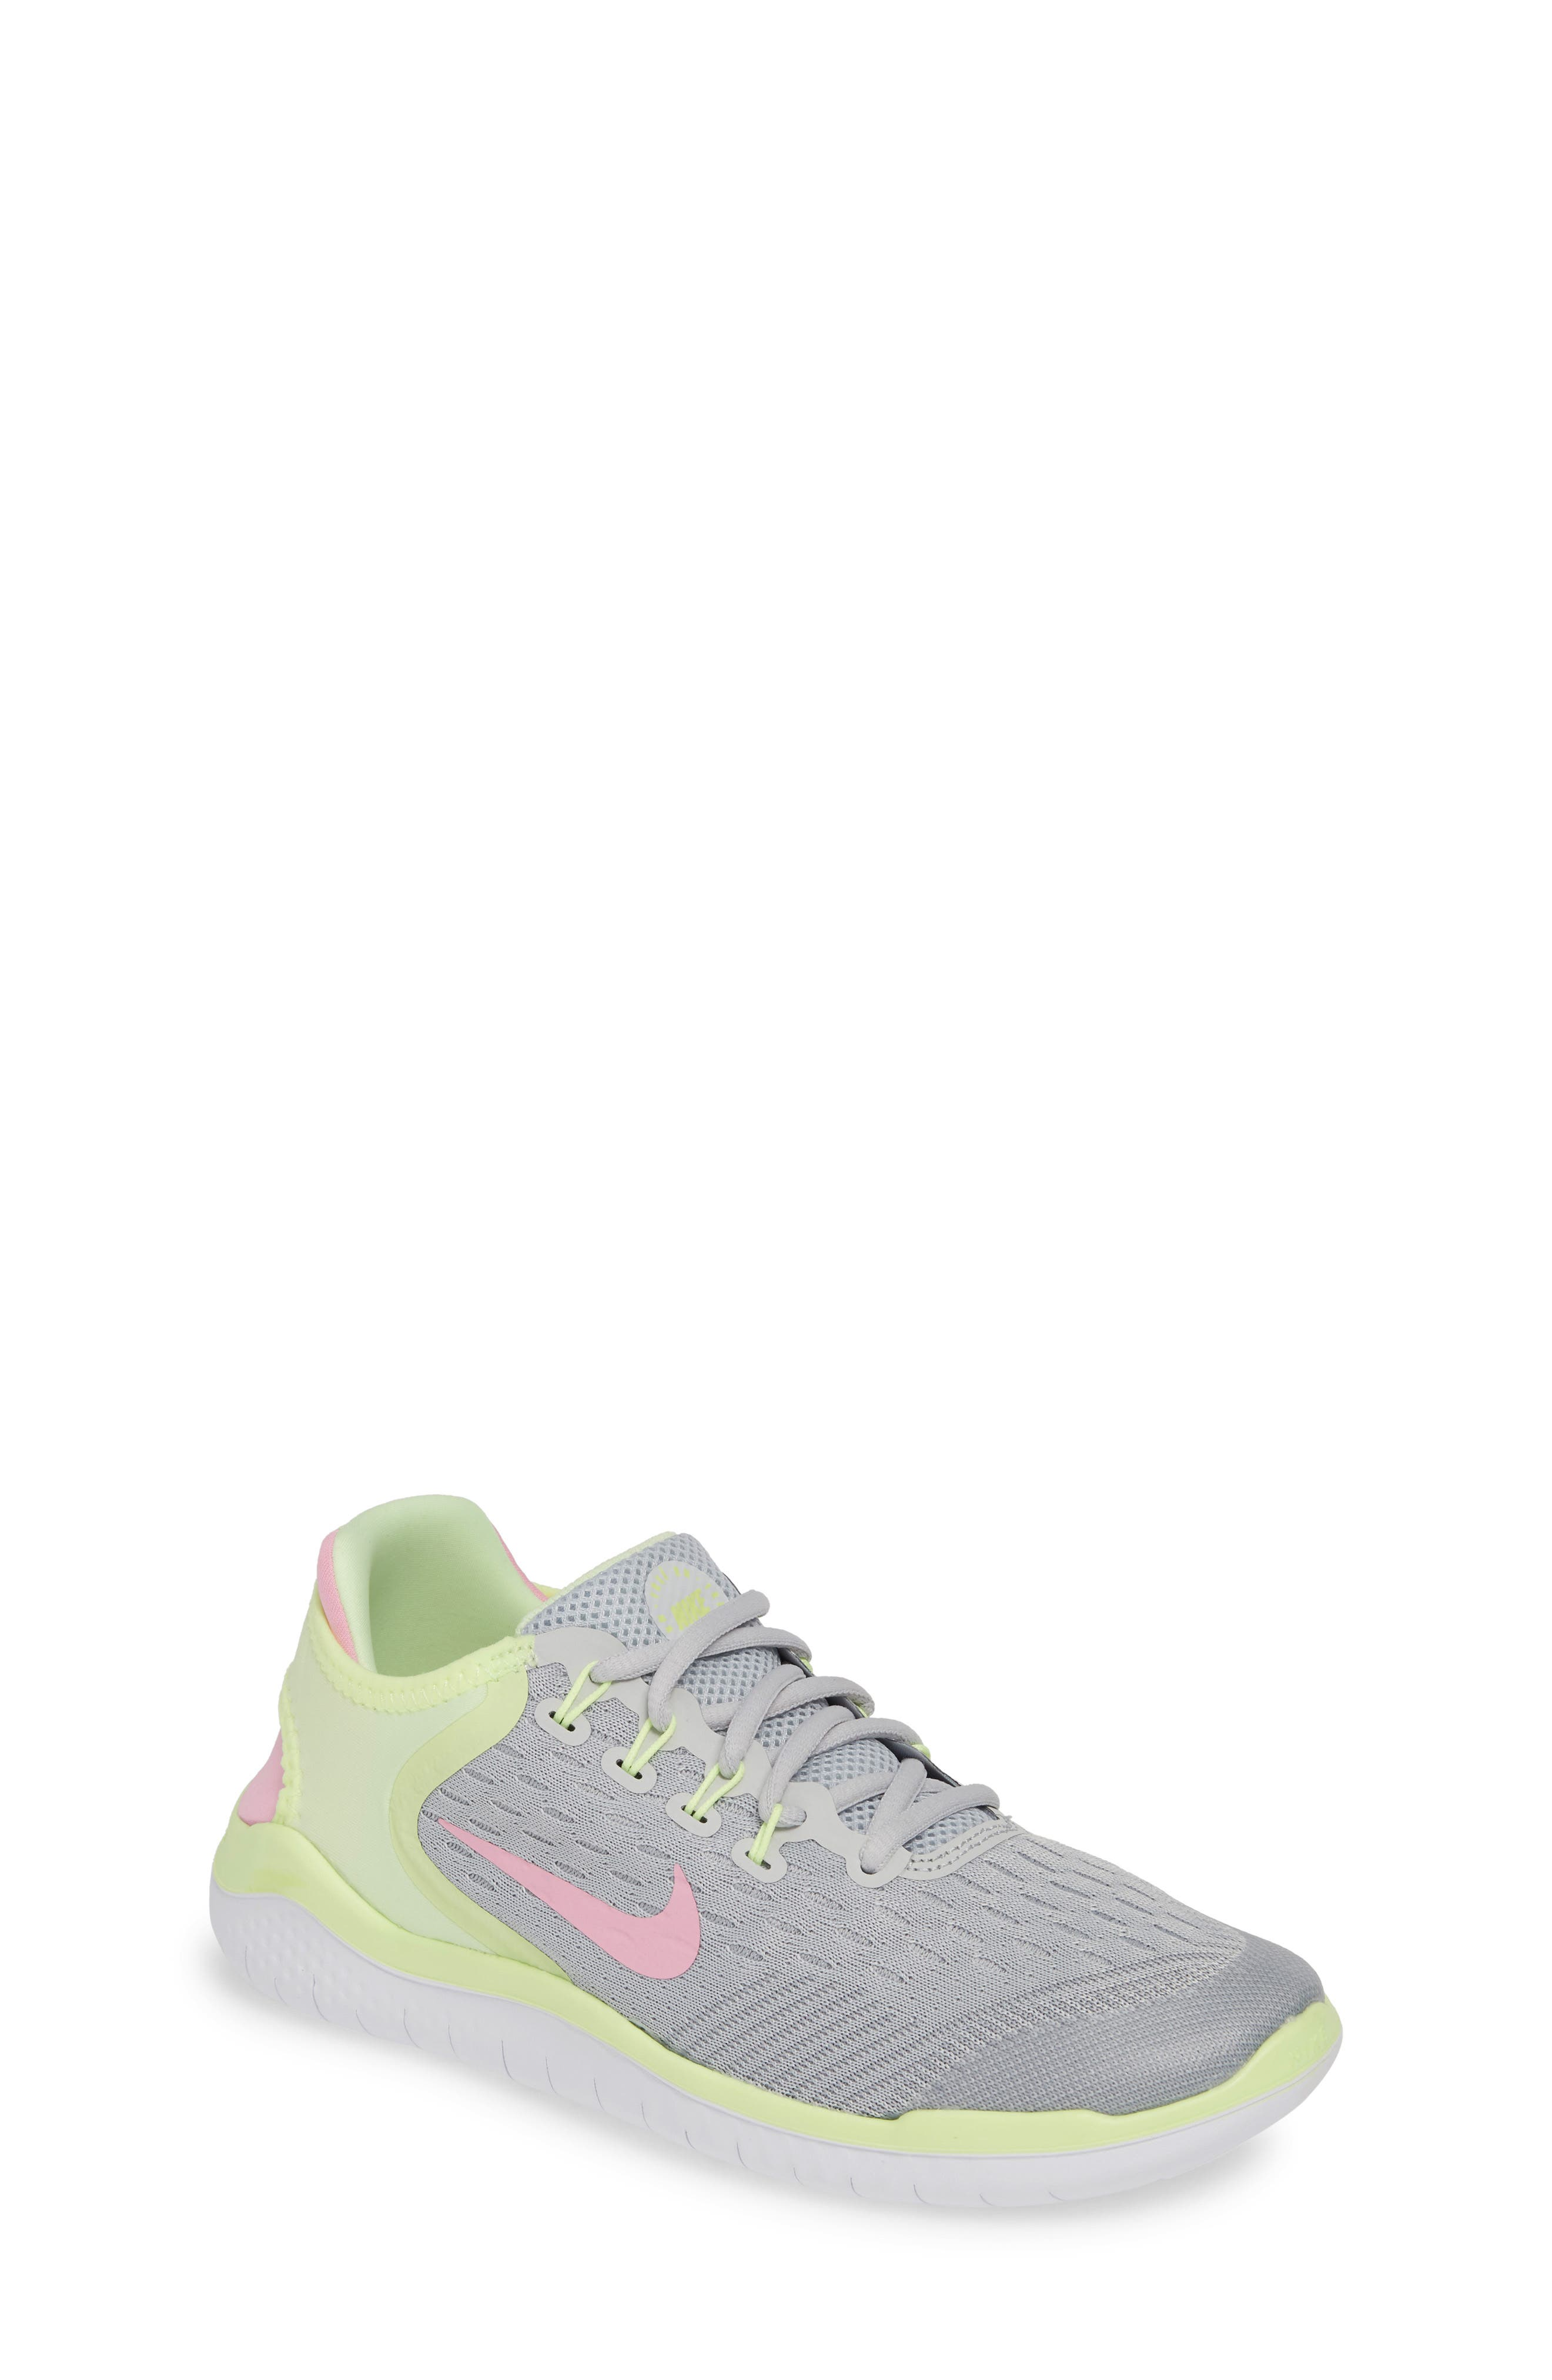 17e7c6c9579f Nike Free Run